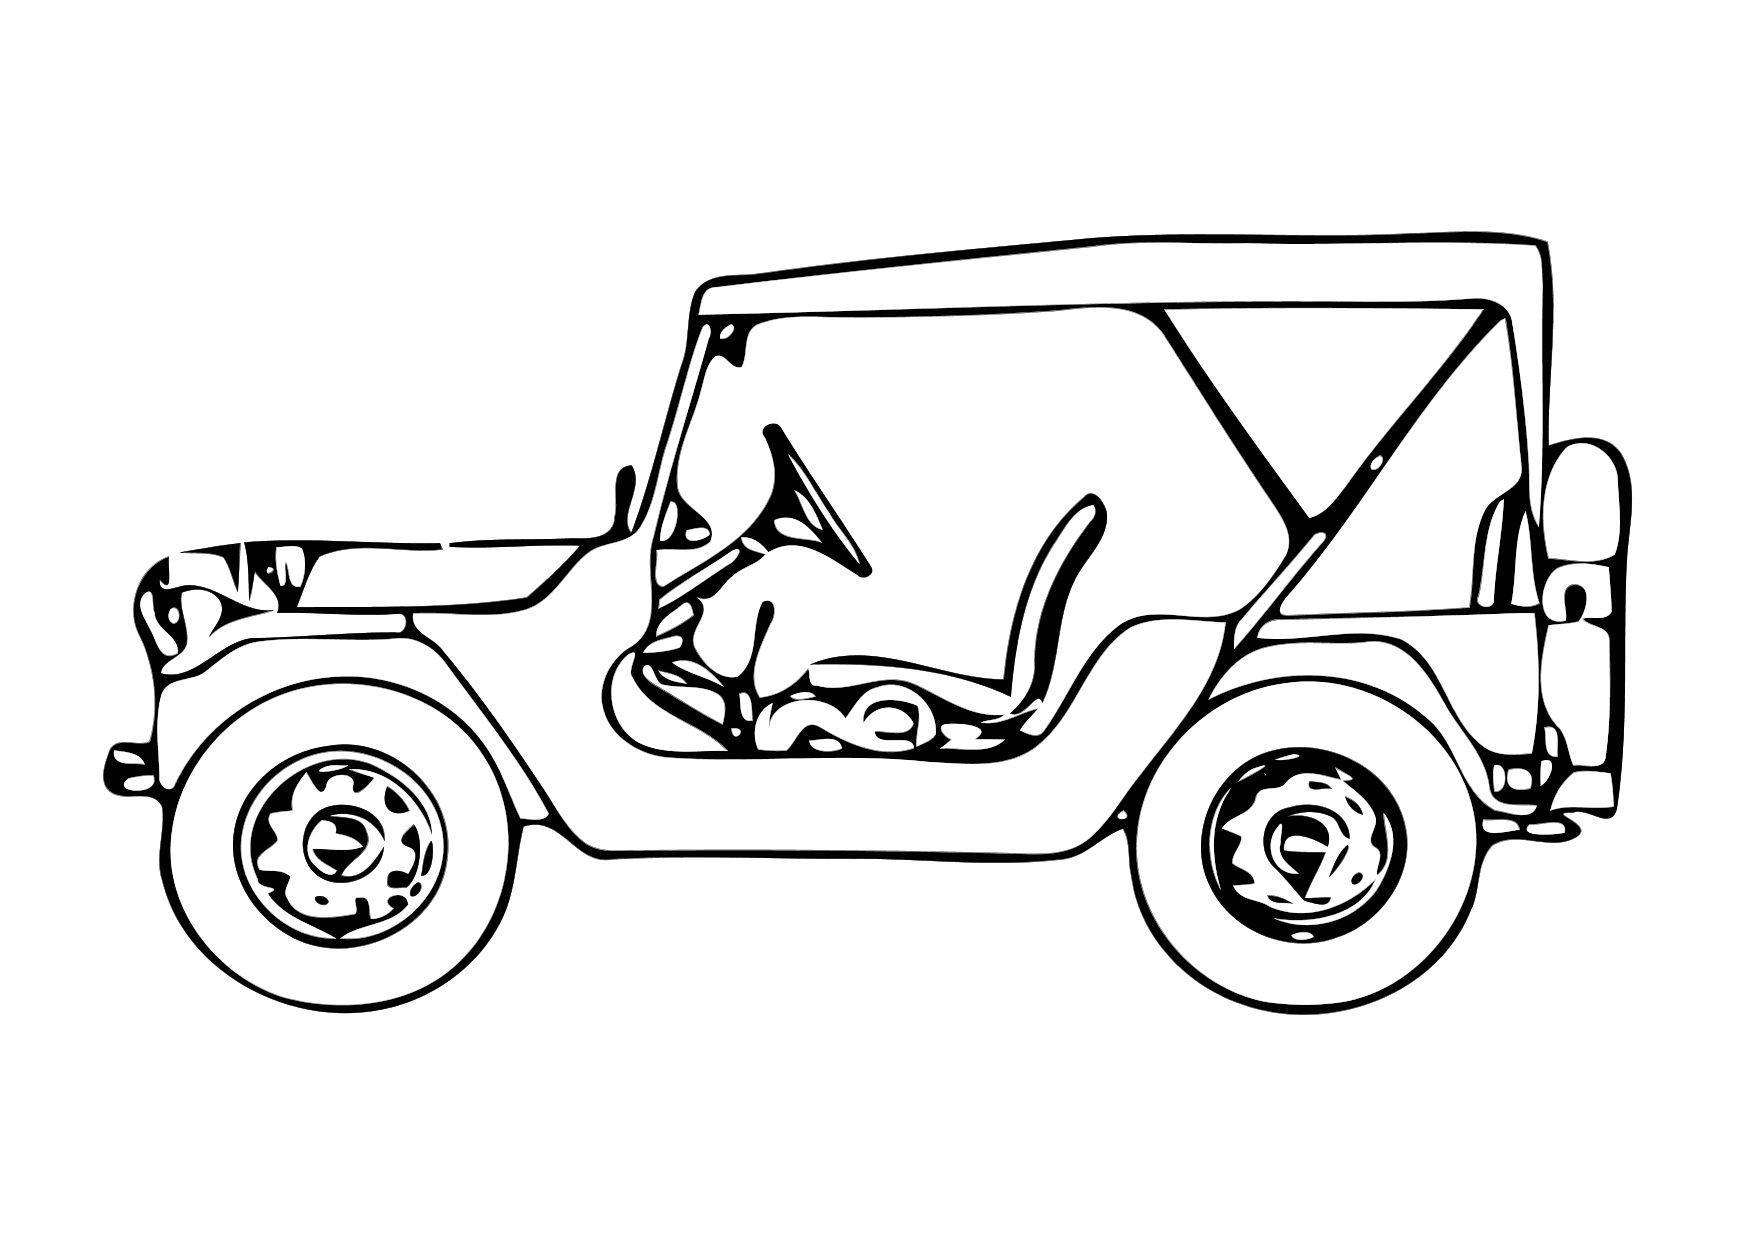 Dibujo para colorear Jeep - Img 11327